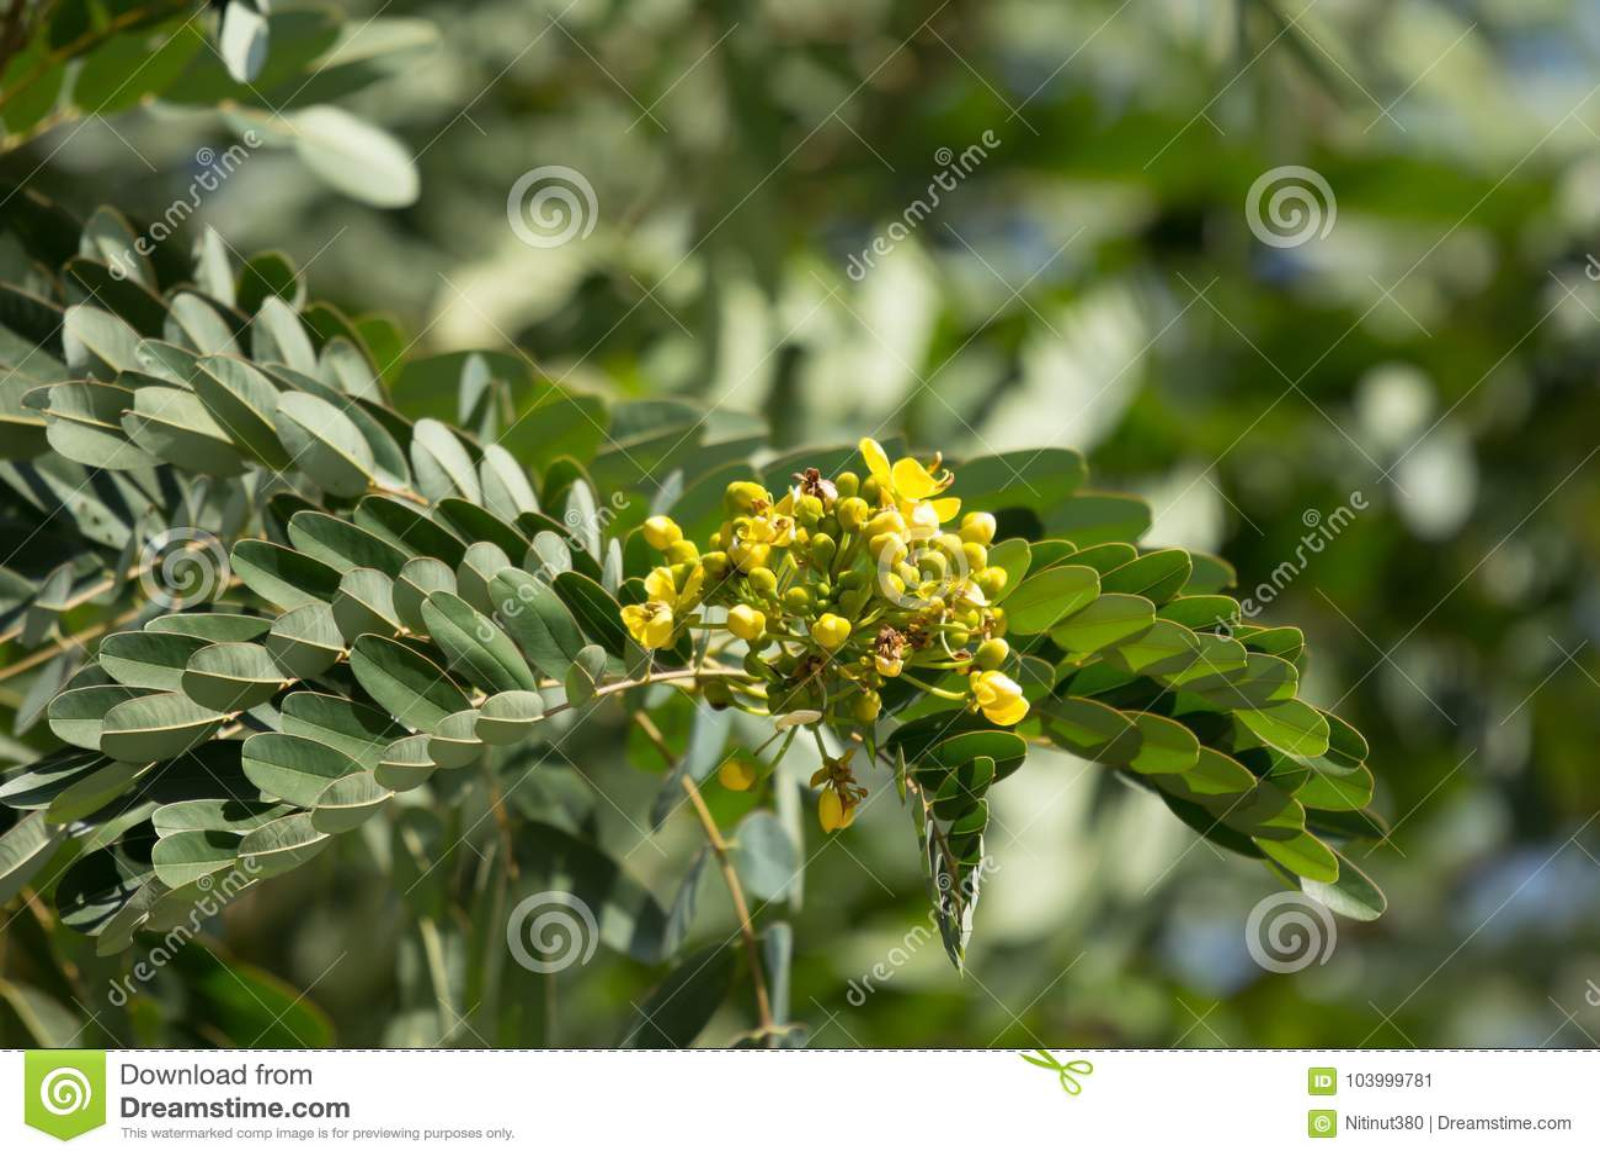 Yellow flower of thai copper pod or cassod tree stock image image download yellow flower of thai copper pod or cassod tree stock image image of background mightylinksfo